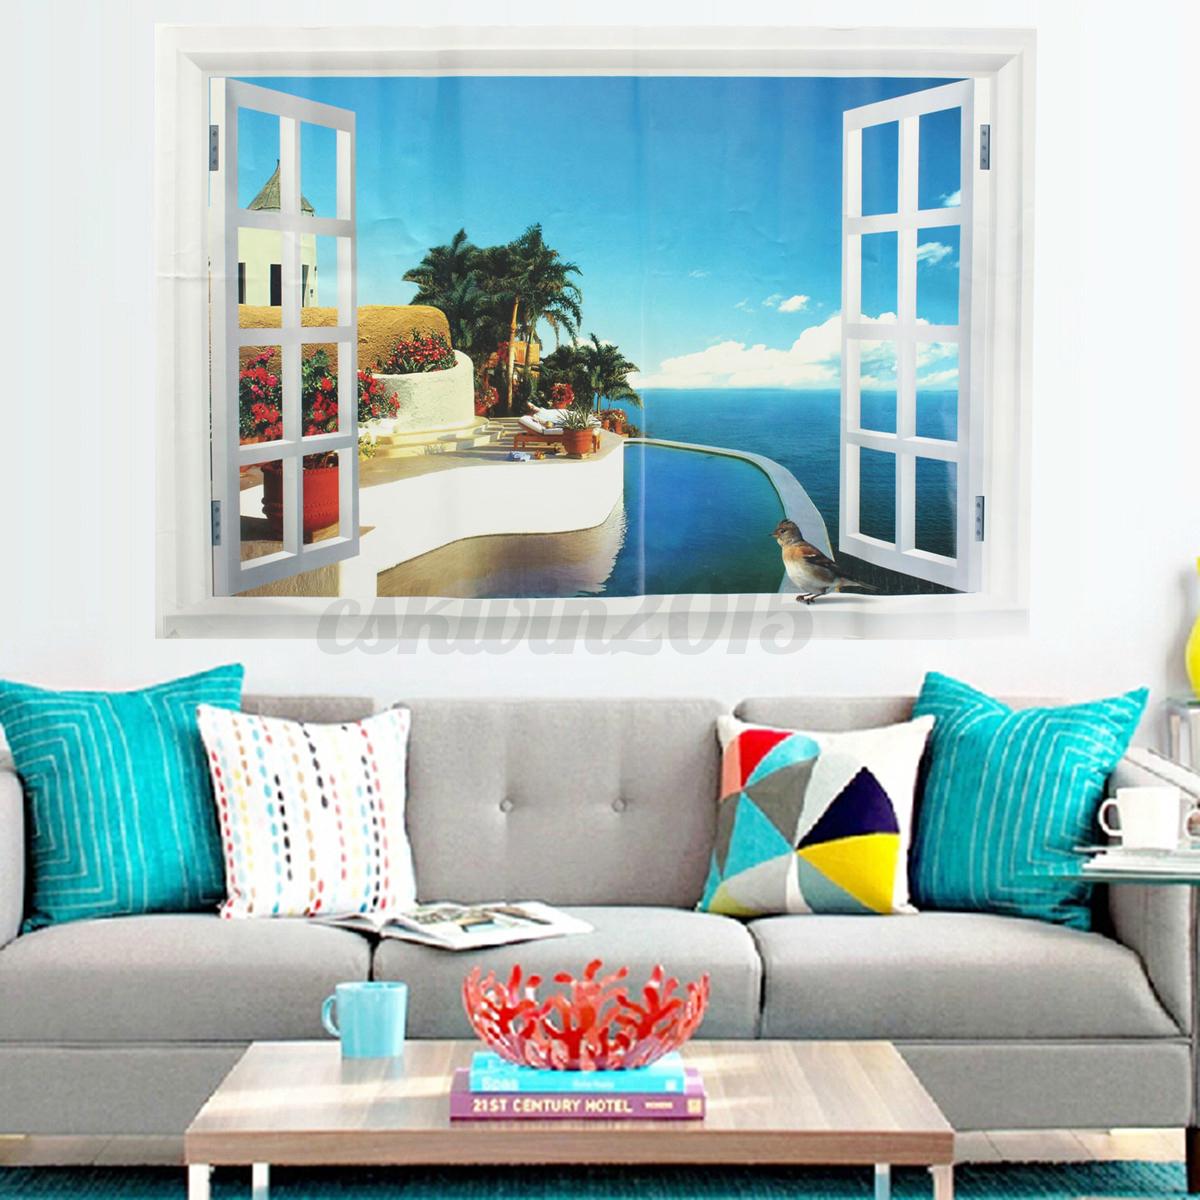 3d ocean beach window wall sticker decals room decor vinyl for 3d room decor